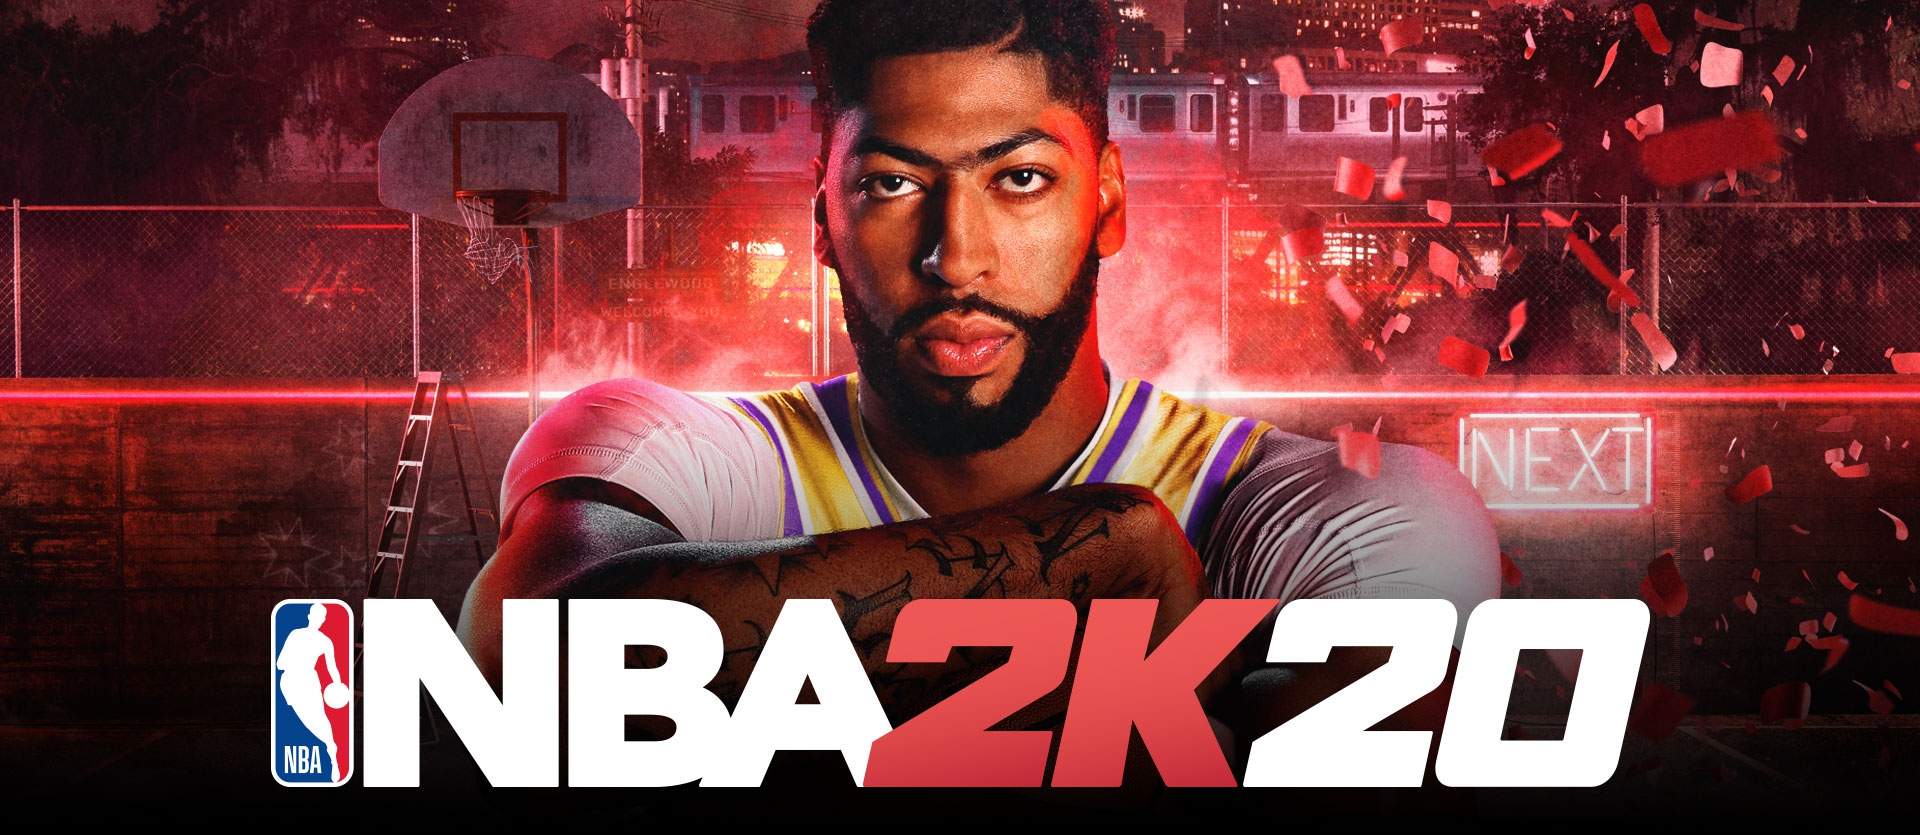 Recensione NBA 2K20